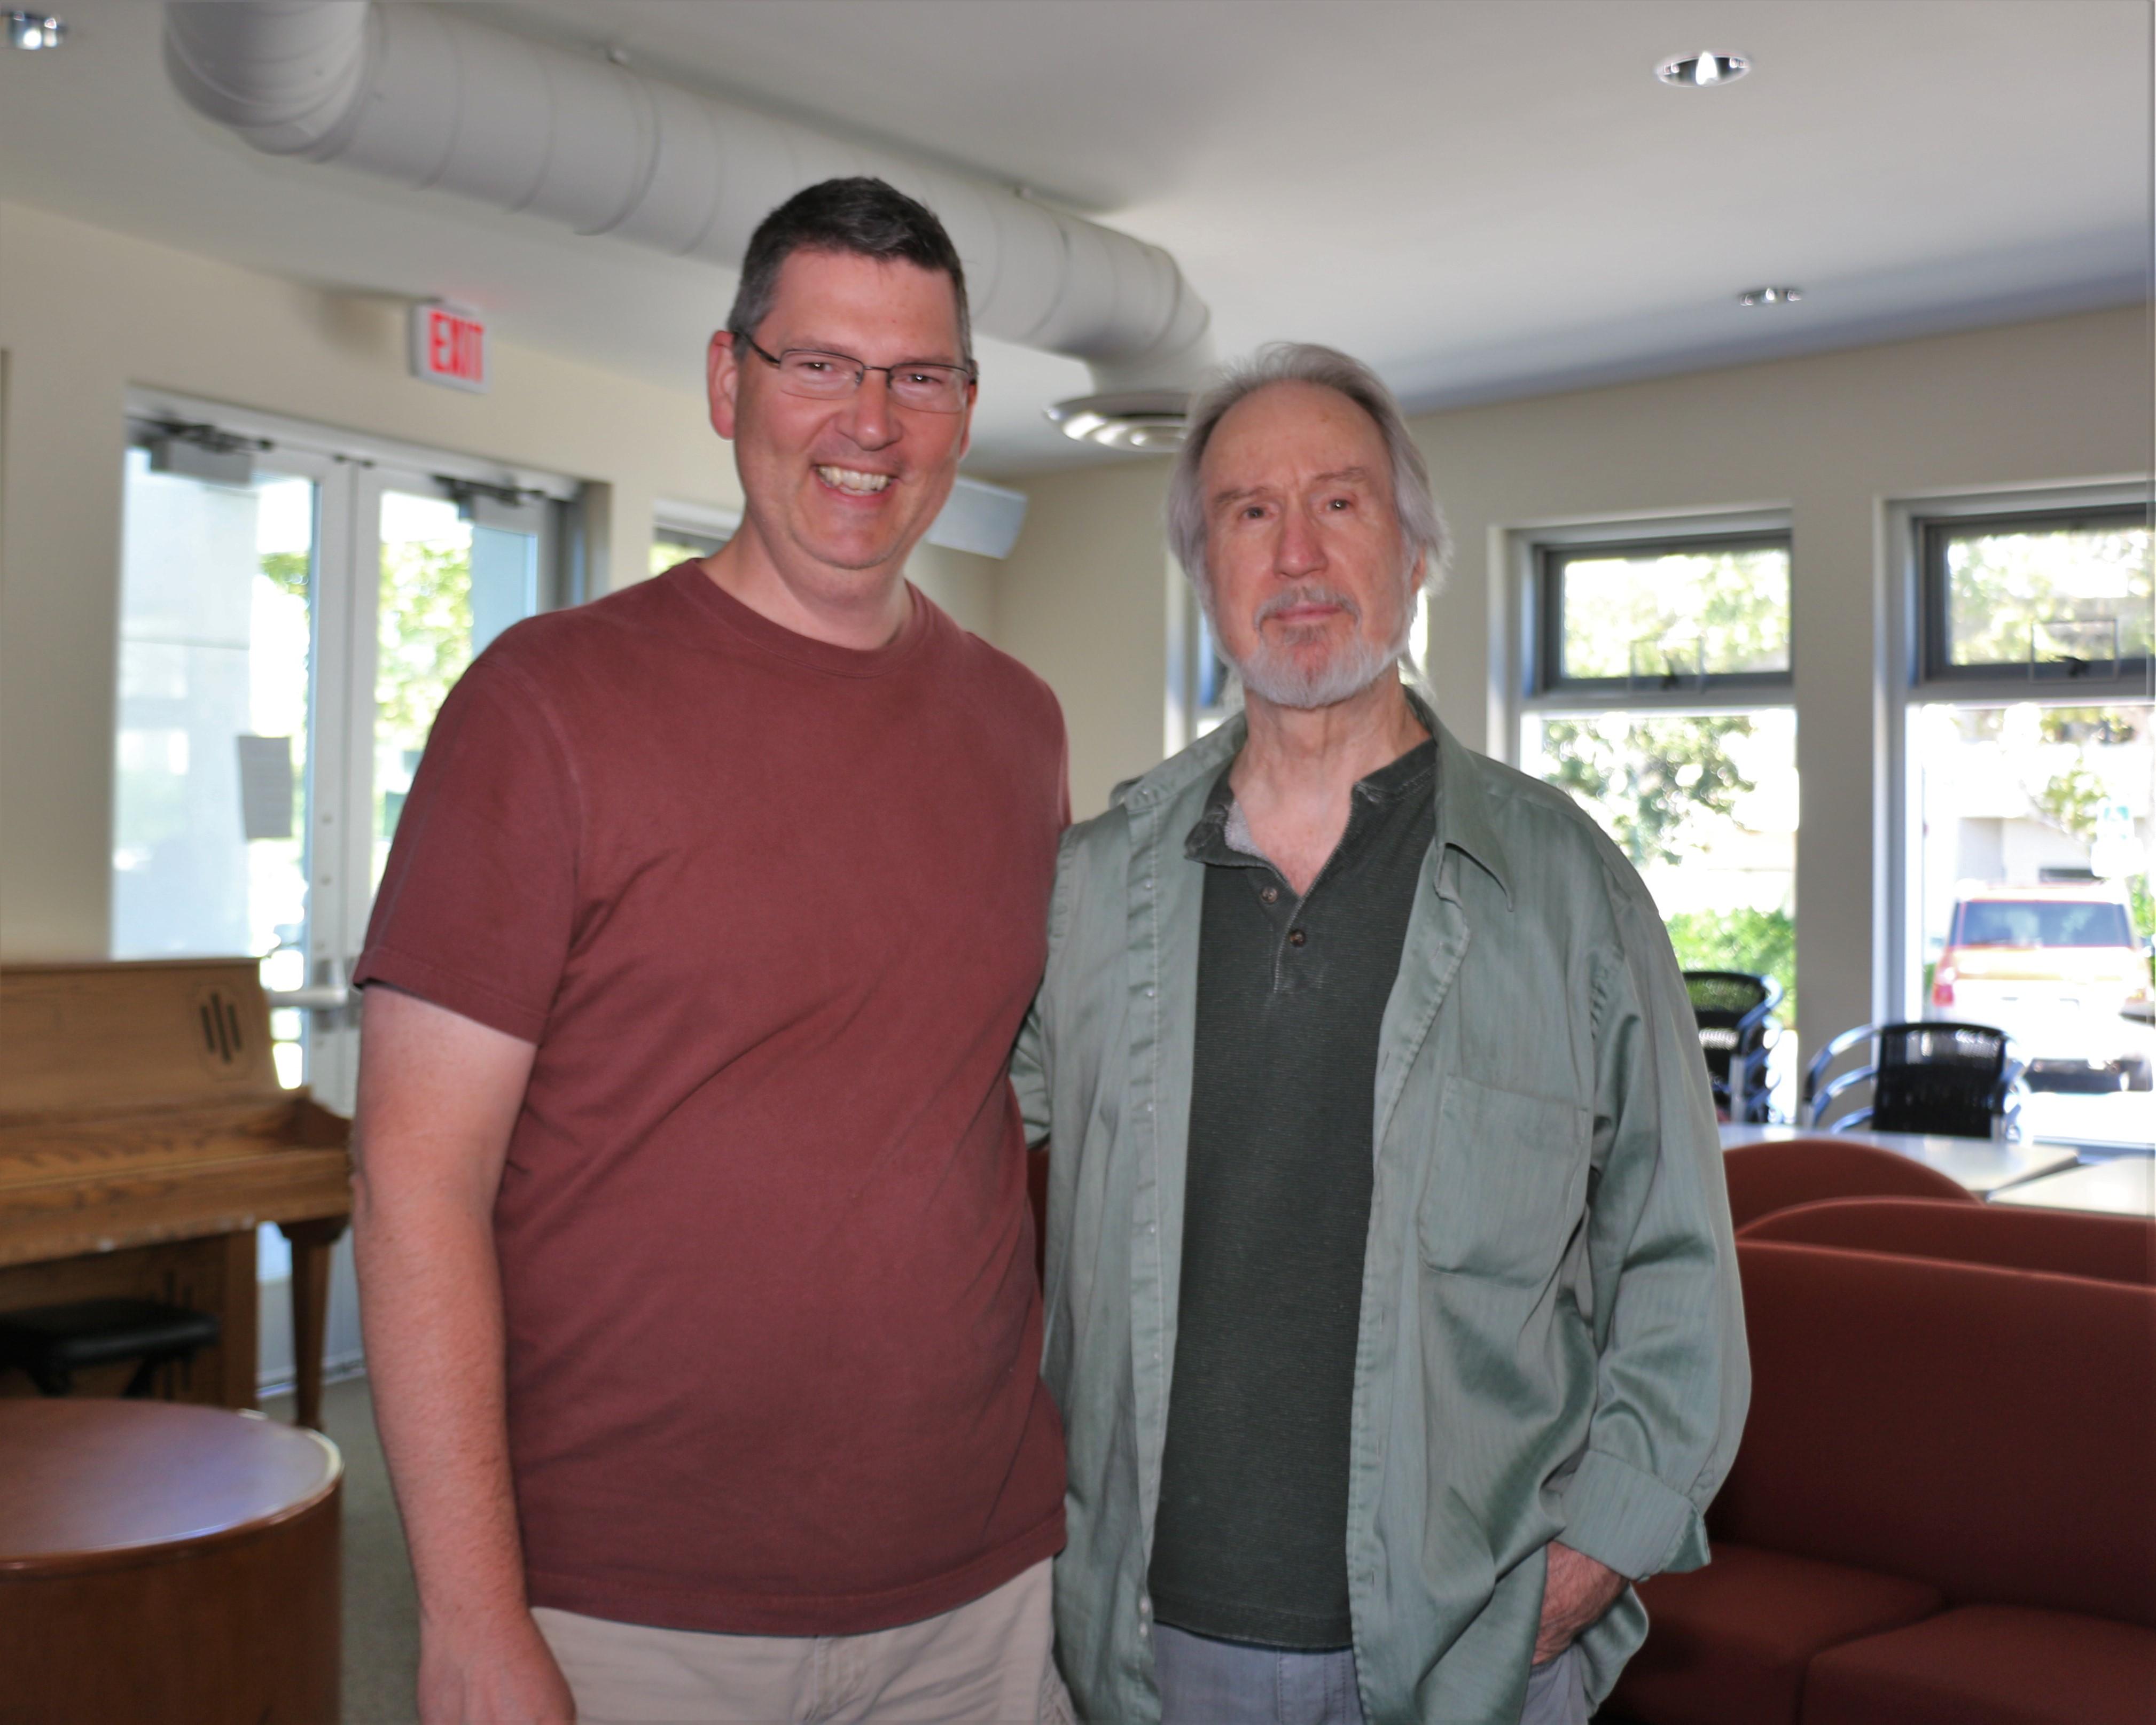 With Emmett Chapman